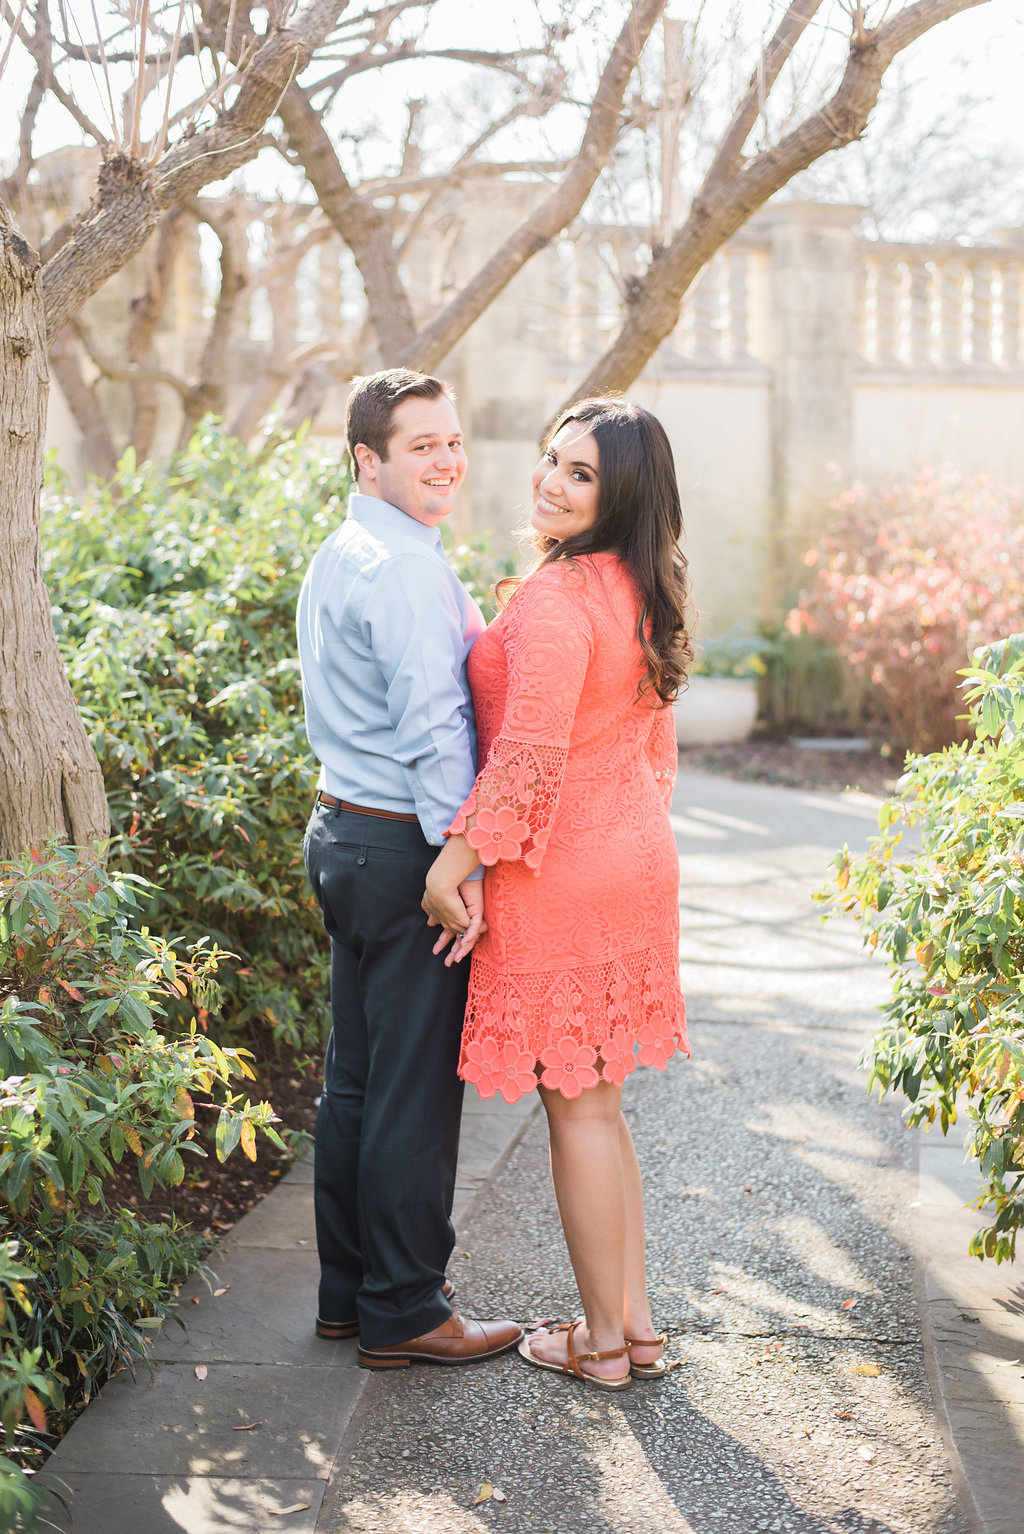 Crystal-Neal-Spring-Dallas-Arboretum-Engagement-Gray-Door-Photography7.jpg